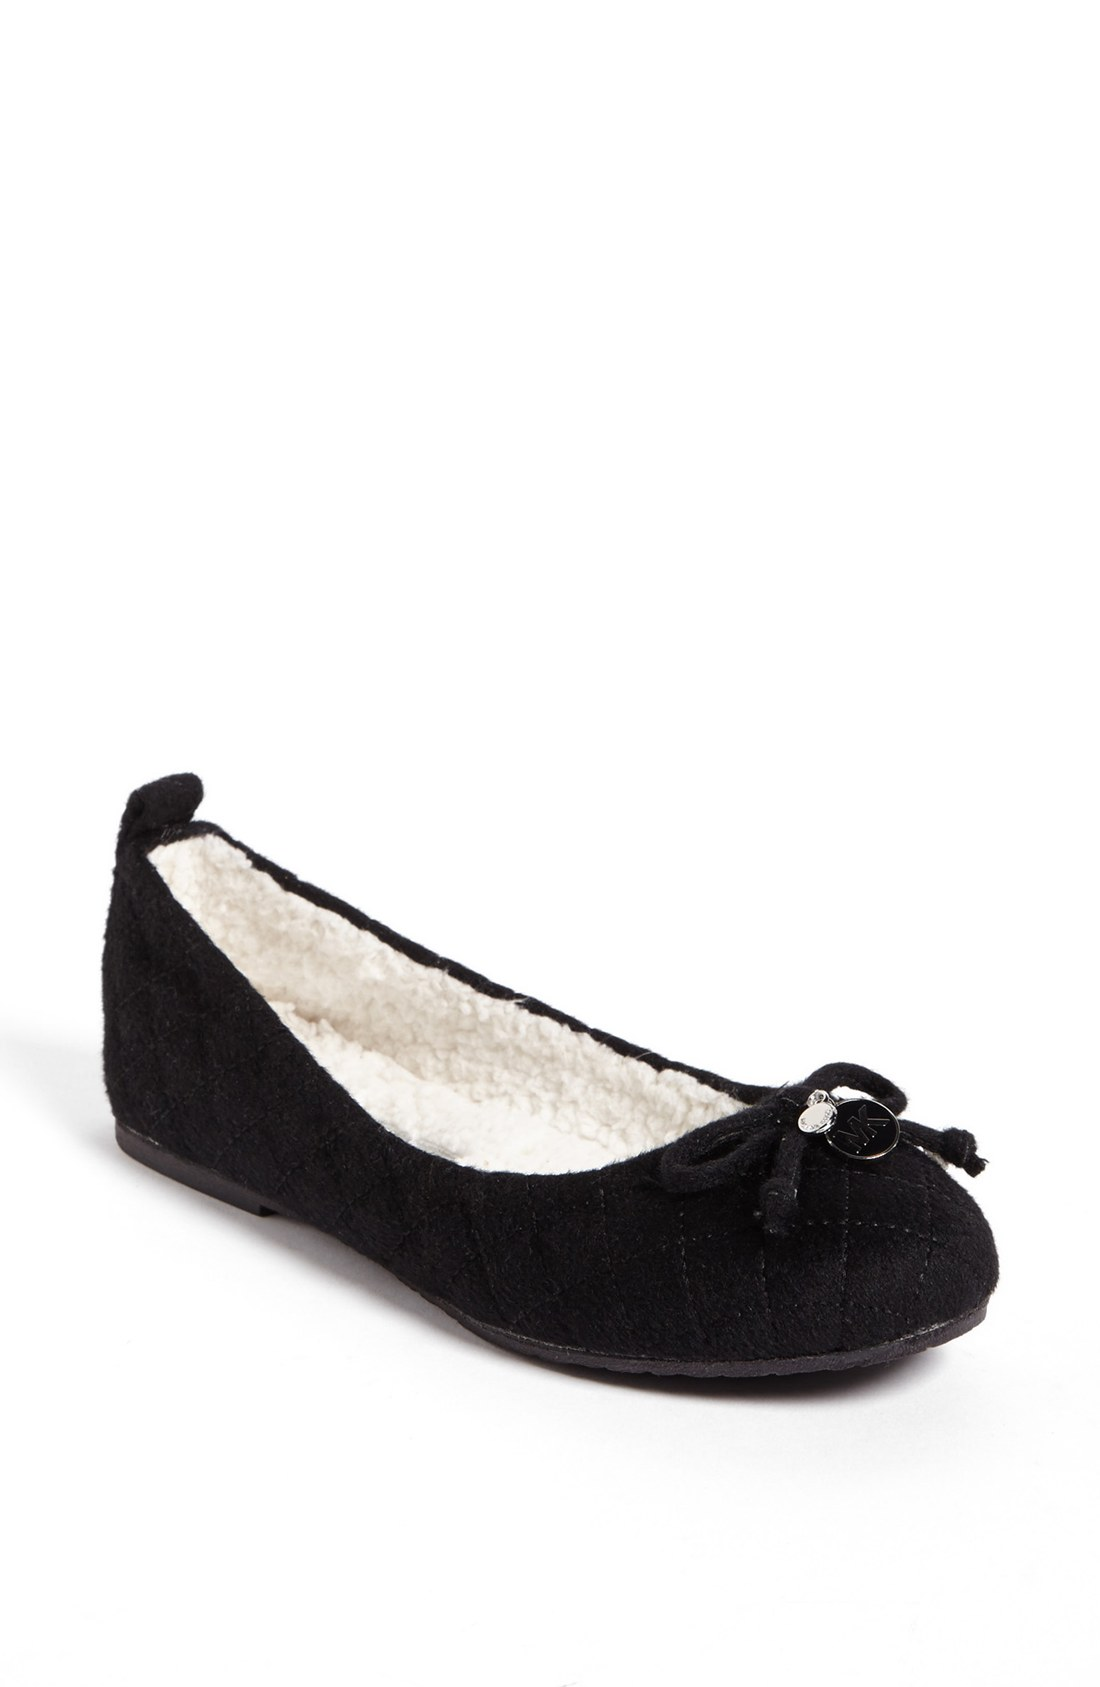 michael michael kors quinn ballet slipper in black lyst. Black Bedroom Furniture Sets. Home Design Ideas